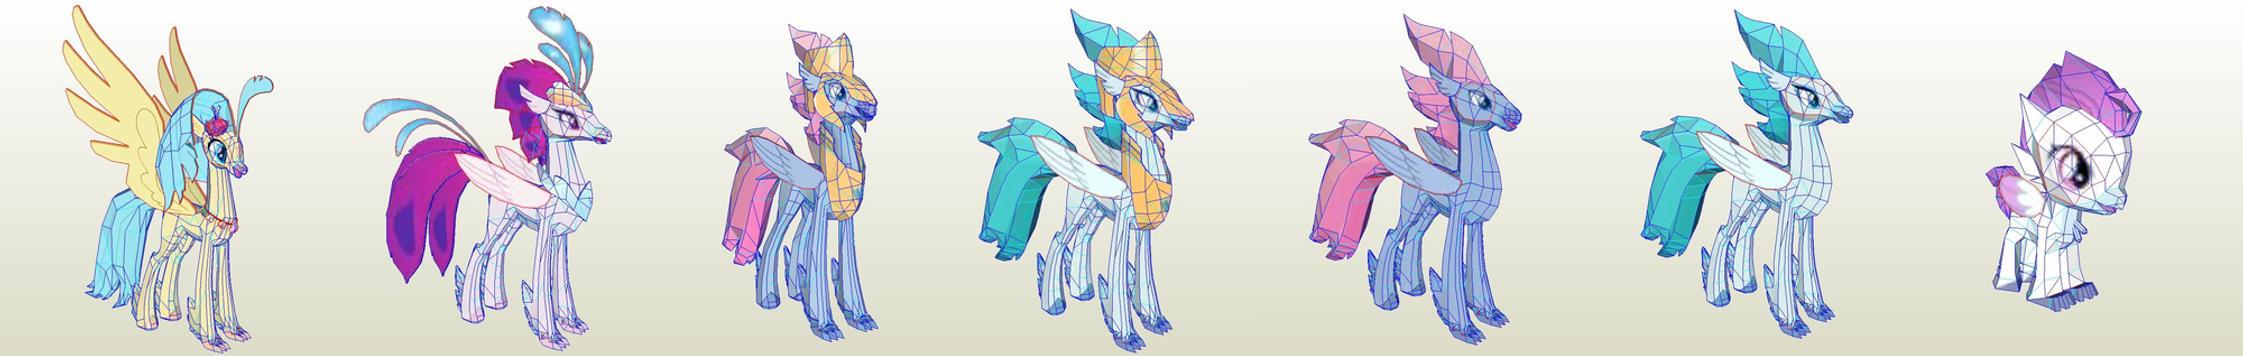 MLP Gameloft Regal Hippogriffs by PapercraftKing